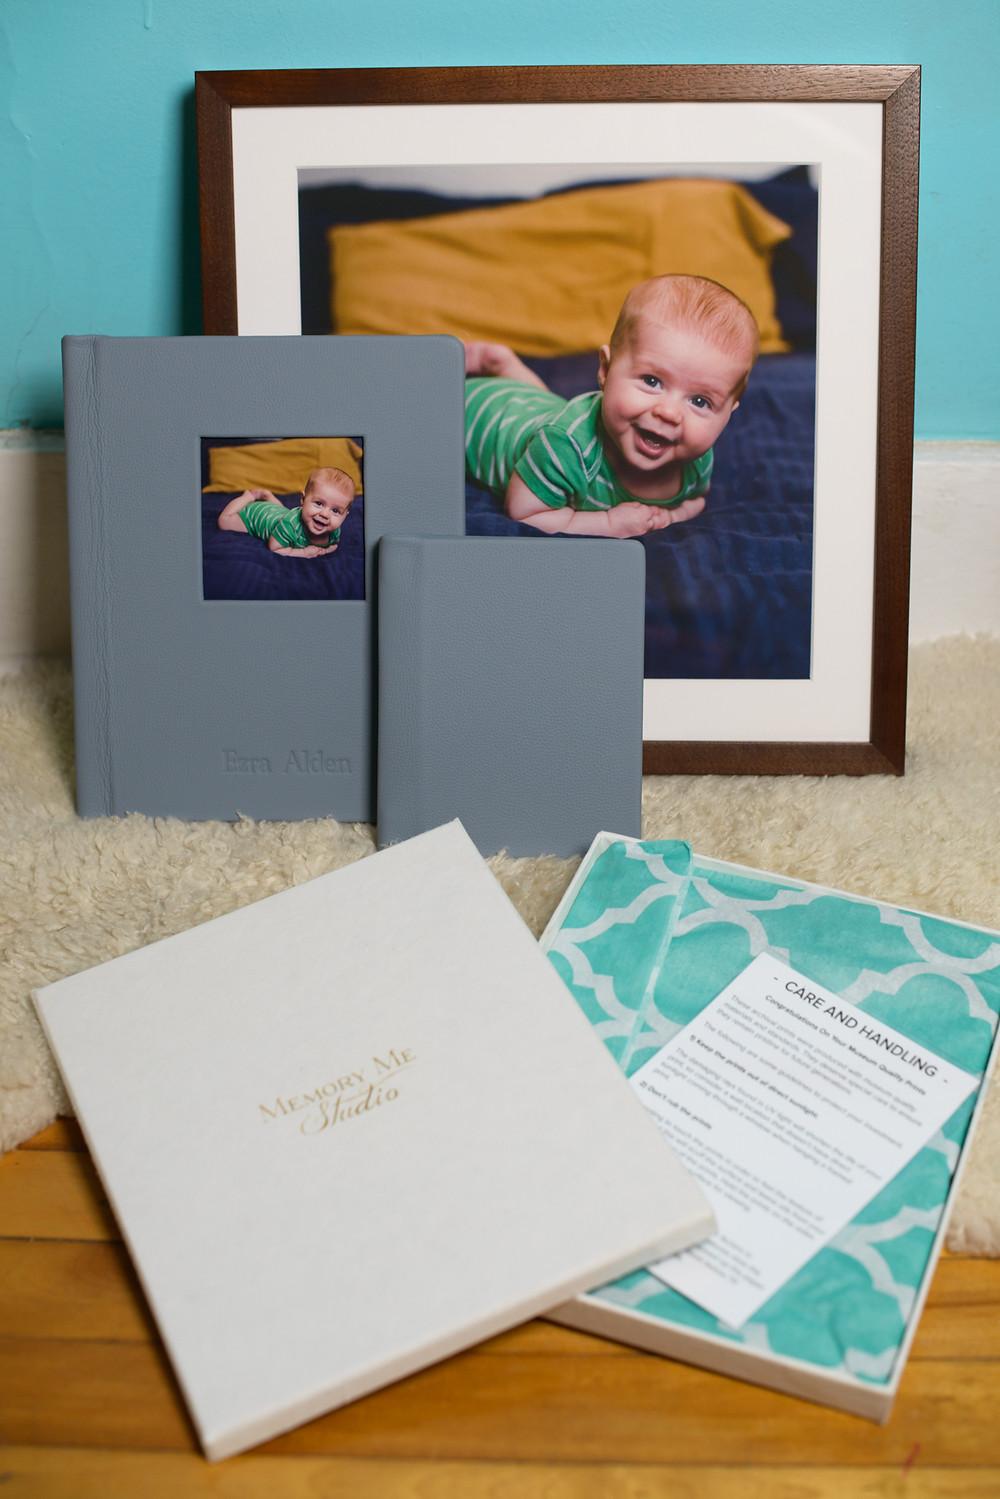 3 month milestone portrait showcased in custom framed print and heirloom album.